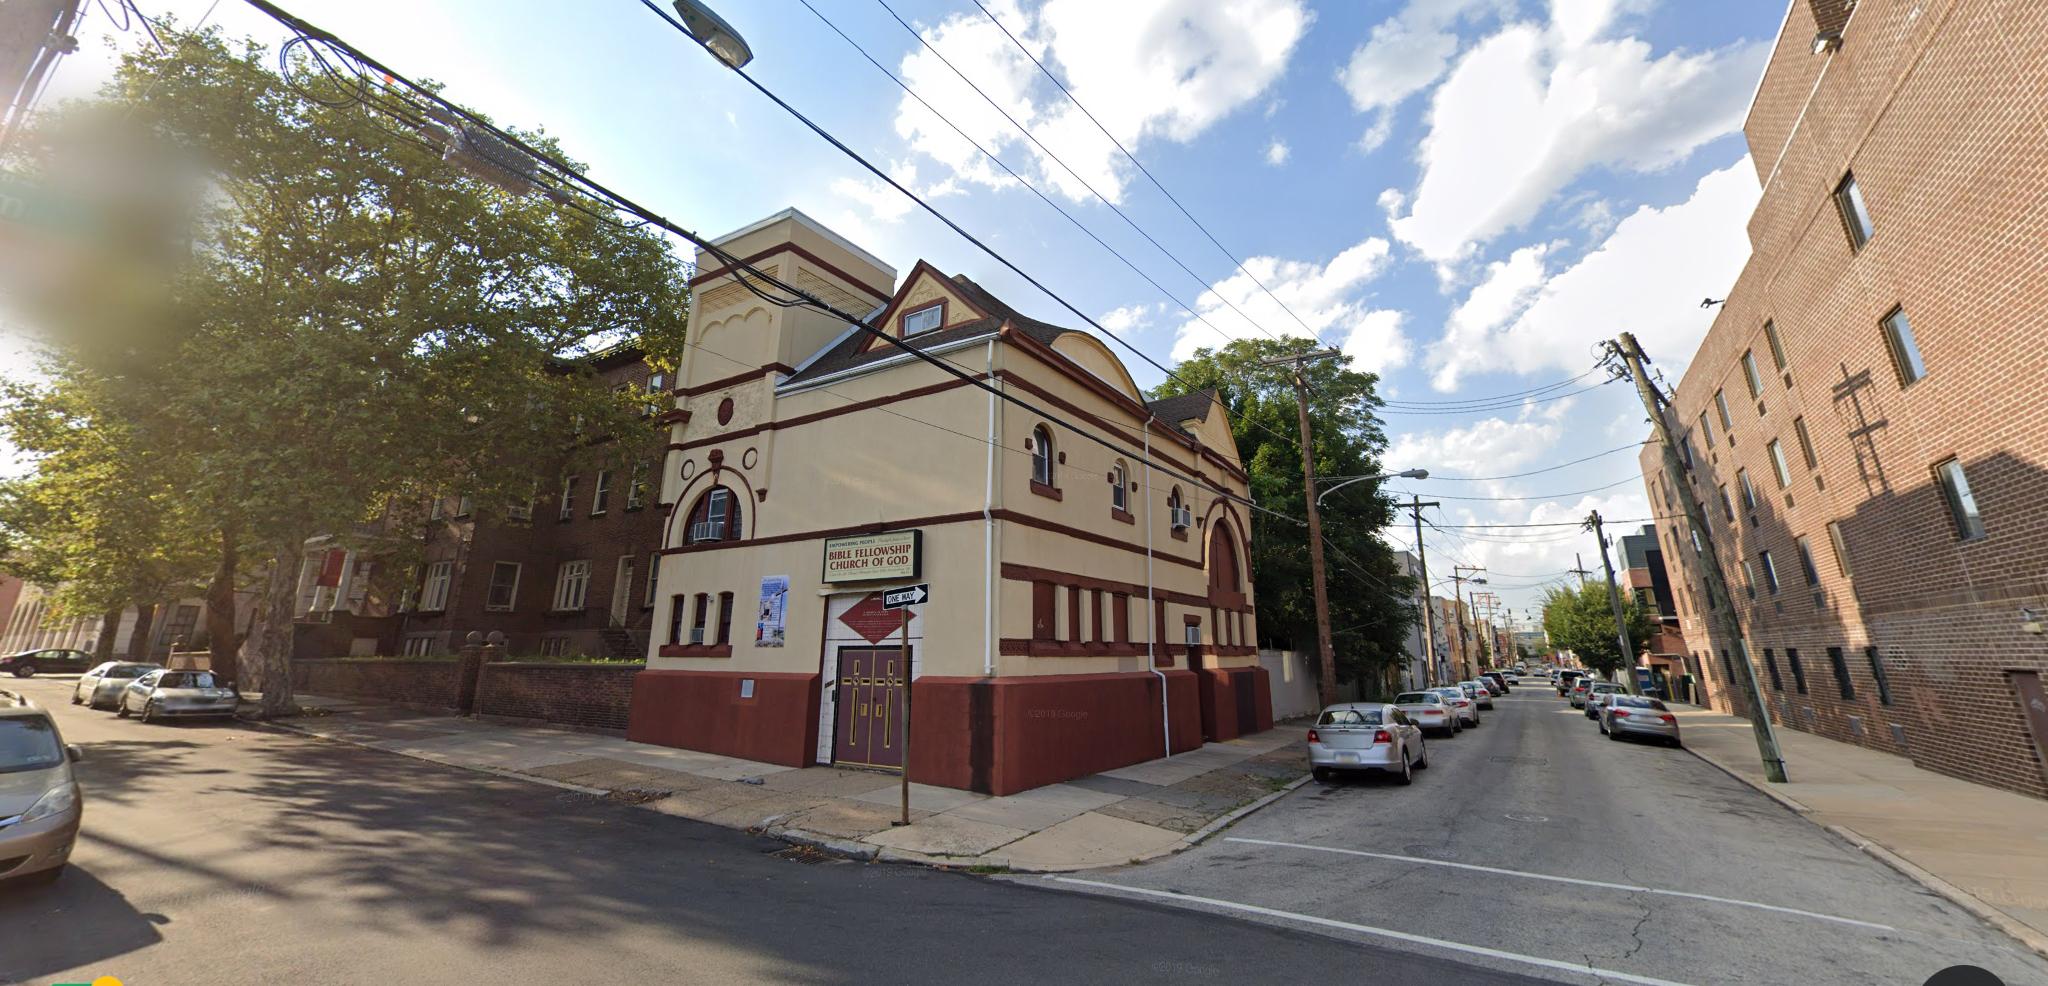 Current view of 1504 North Sydenham Street. Credit: Google.